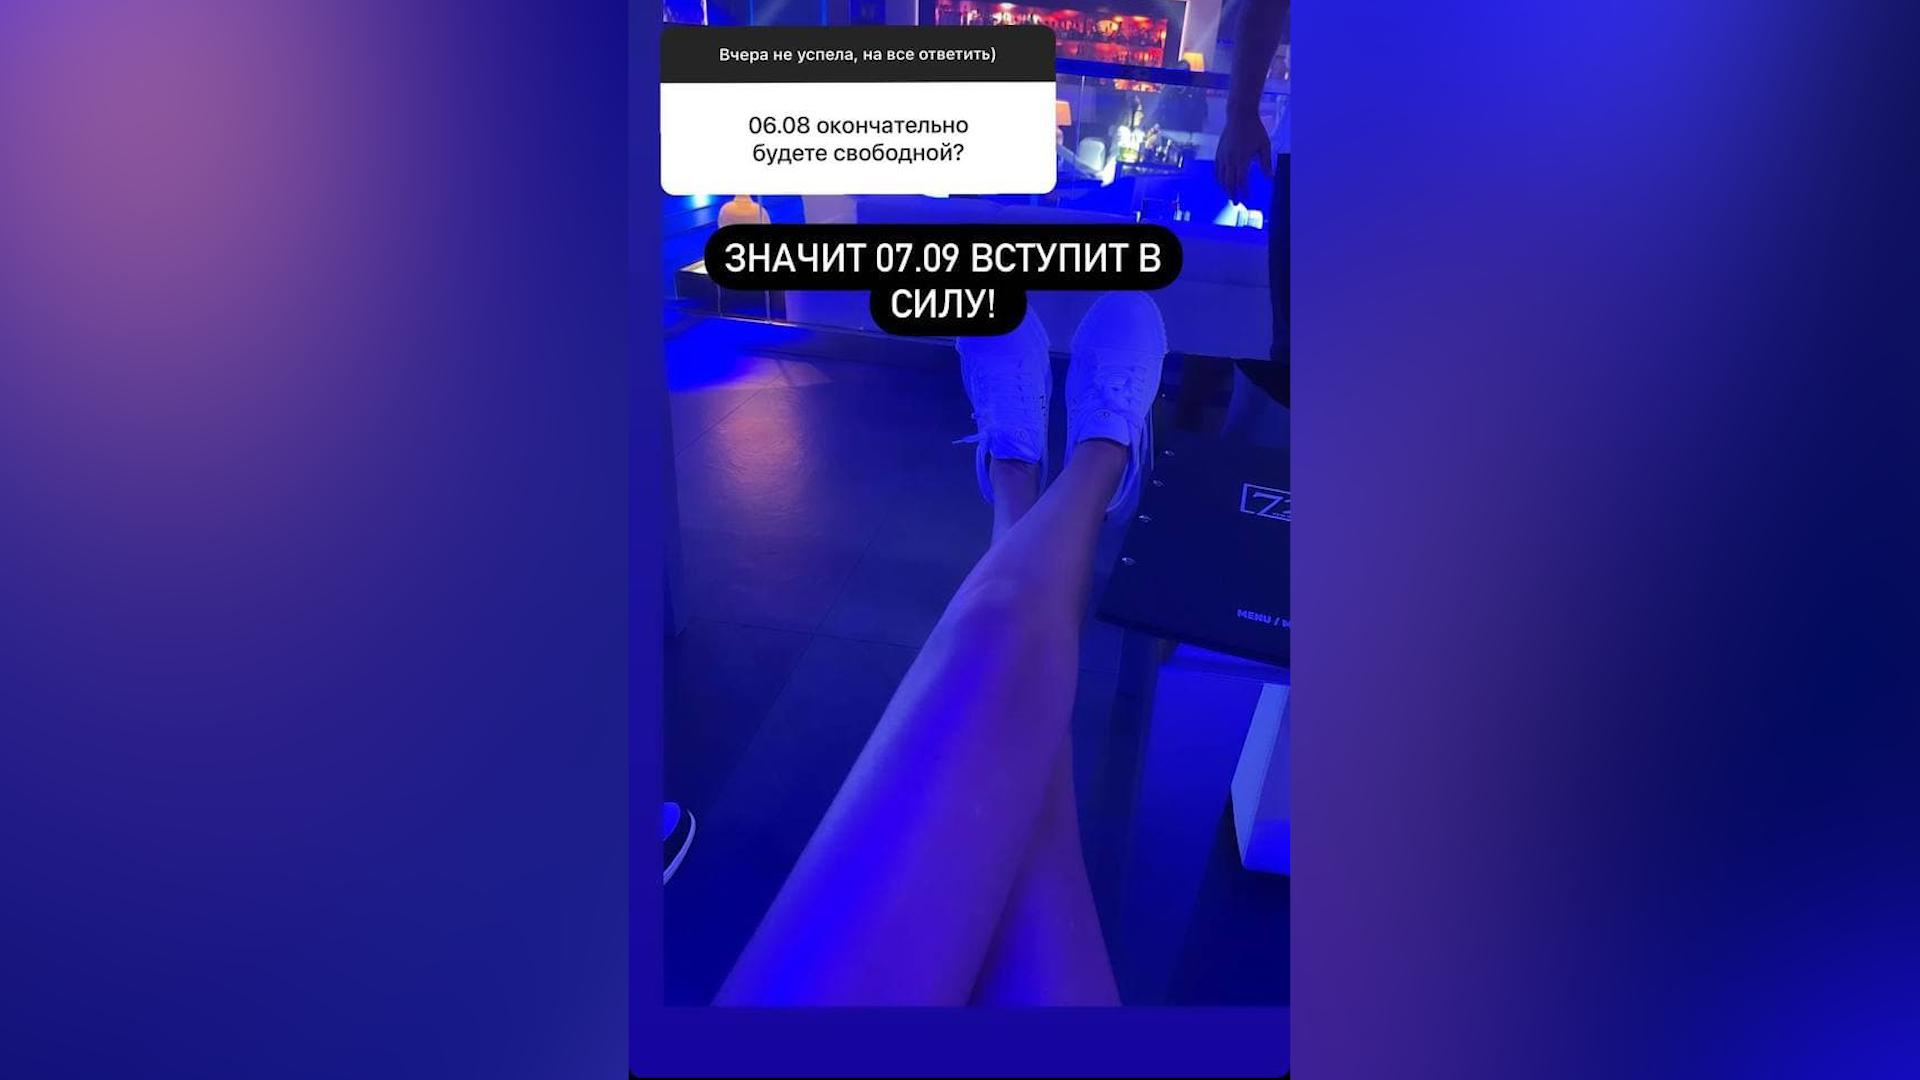 Скриншот сториз © Instagram / borodylia